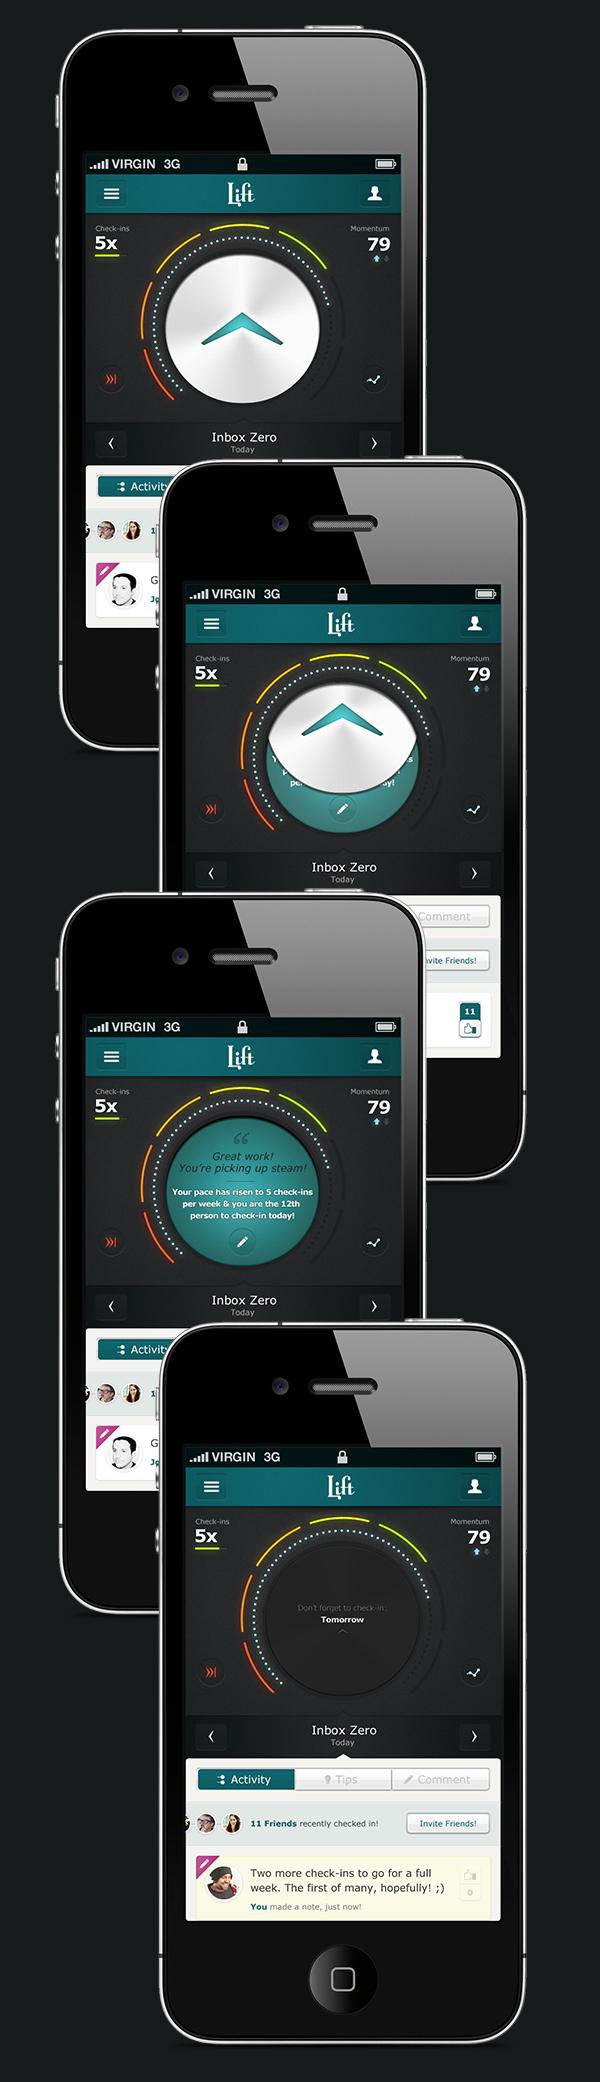 lift app iphone UI ux product habits design Interface visual